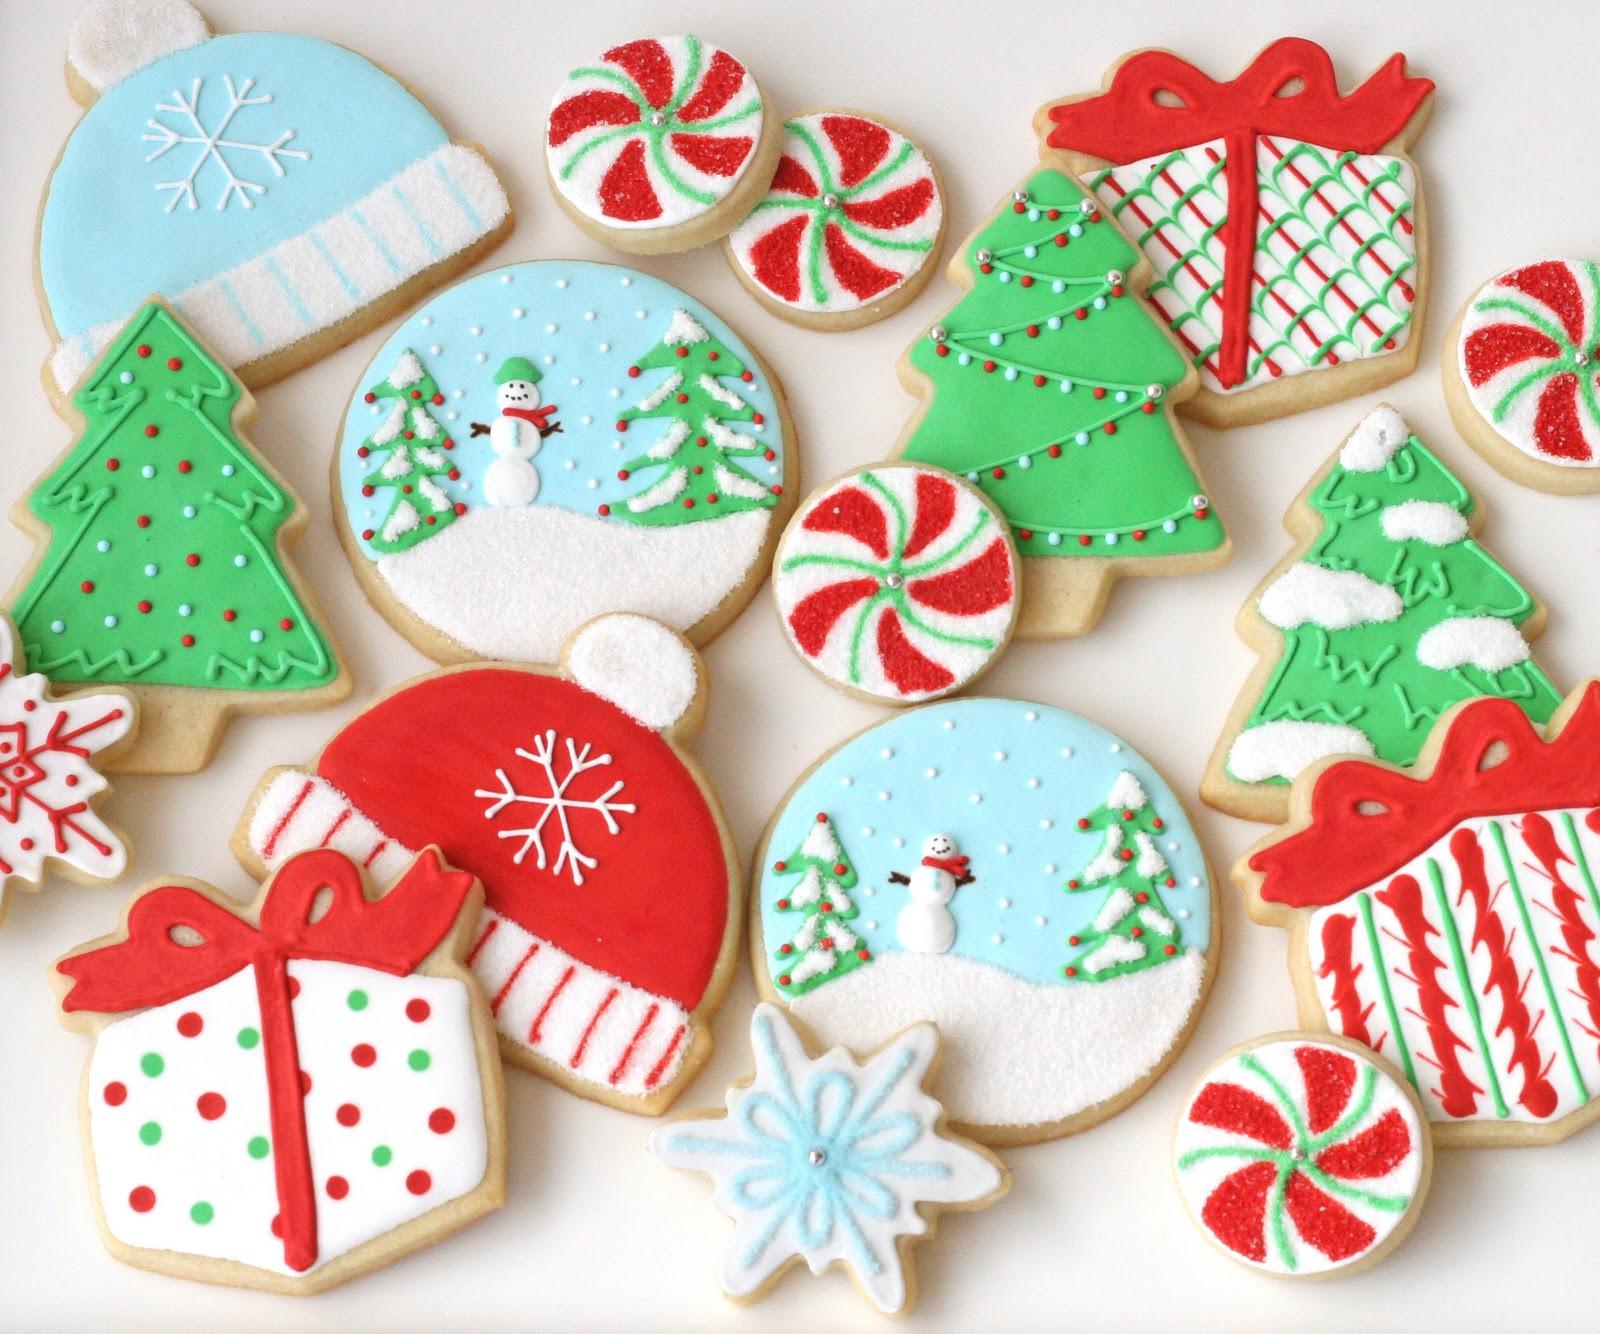 Christmas Sugar Cookie Icing Recipe  Christmas Cookies Galore Glorious Treats